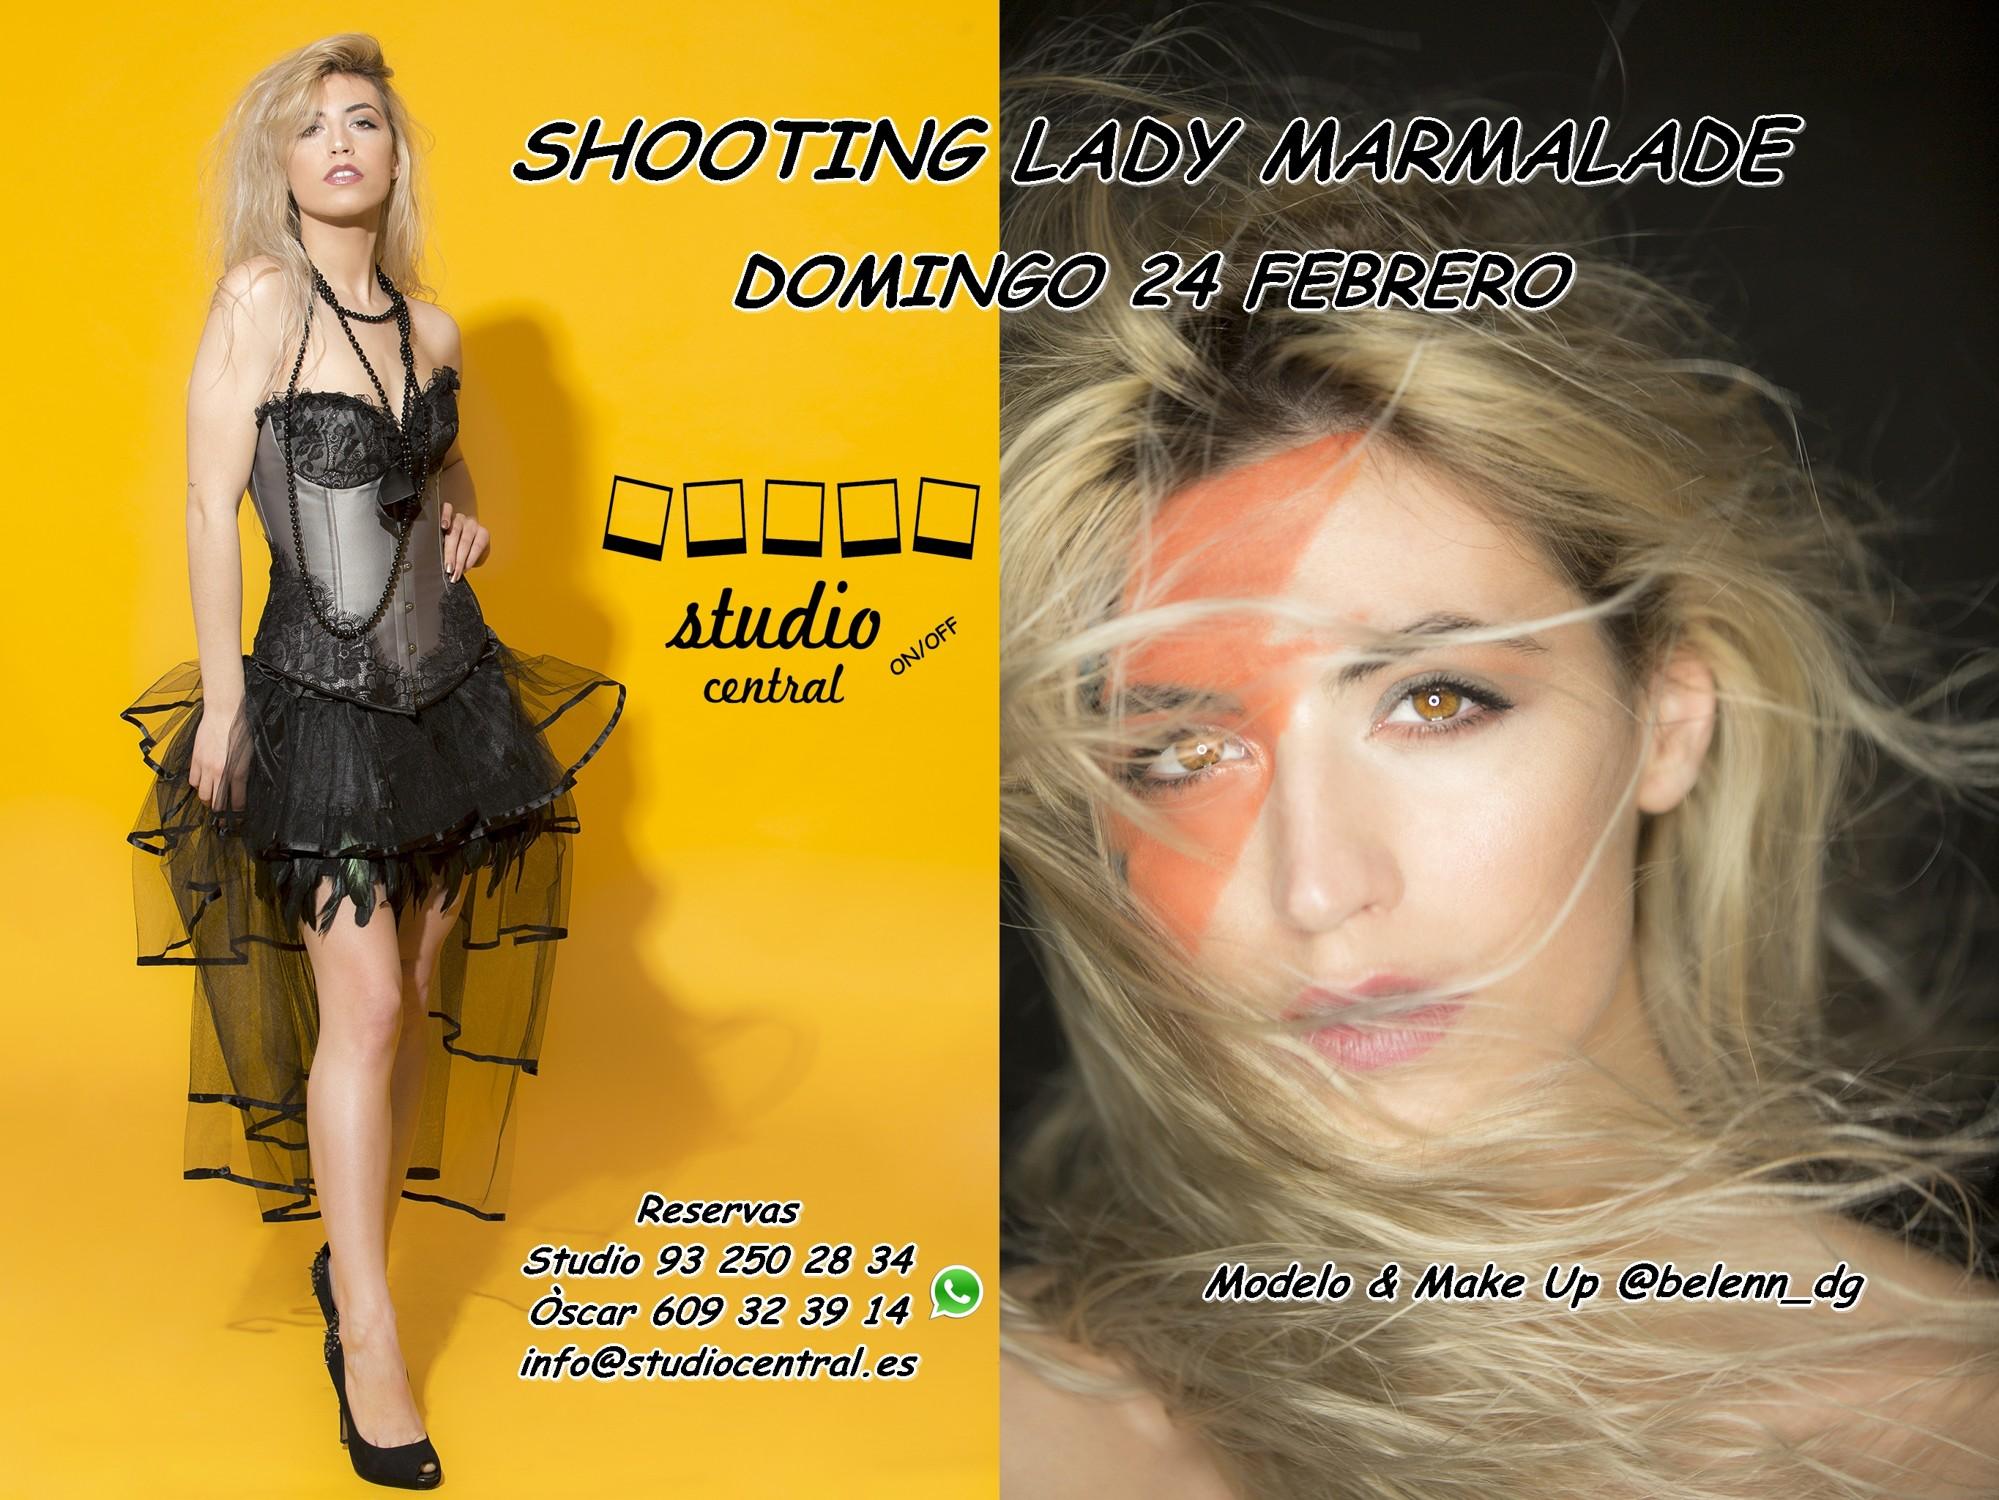 Shooting 24 Febrero 2019 new